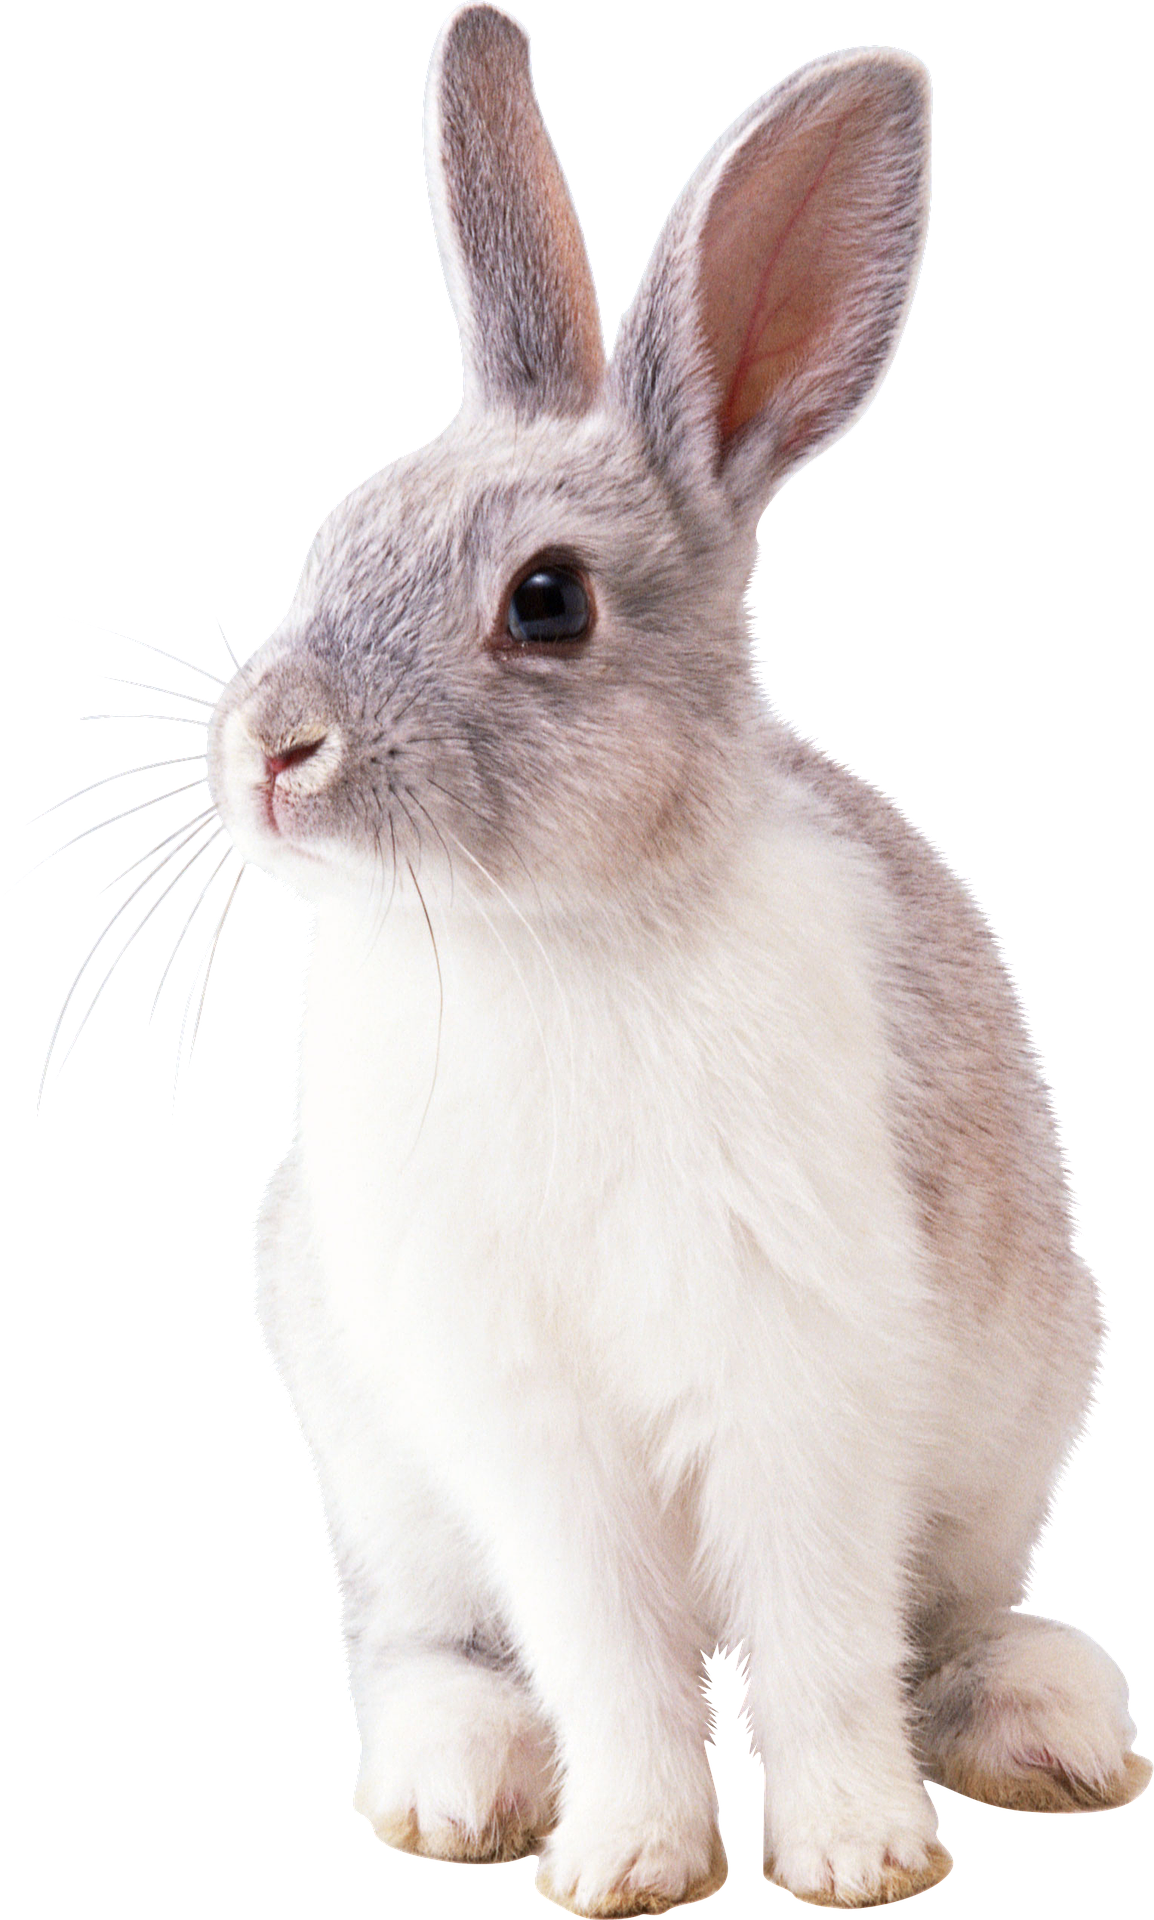 rabbit-2649157_1920.png